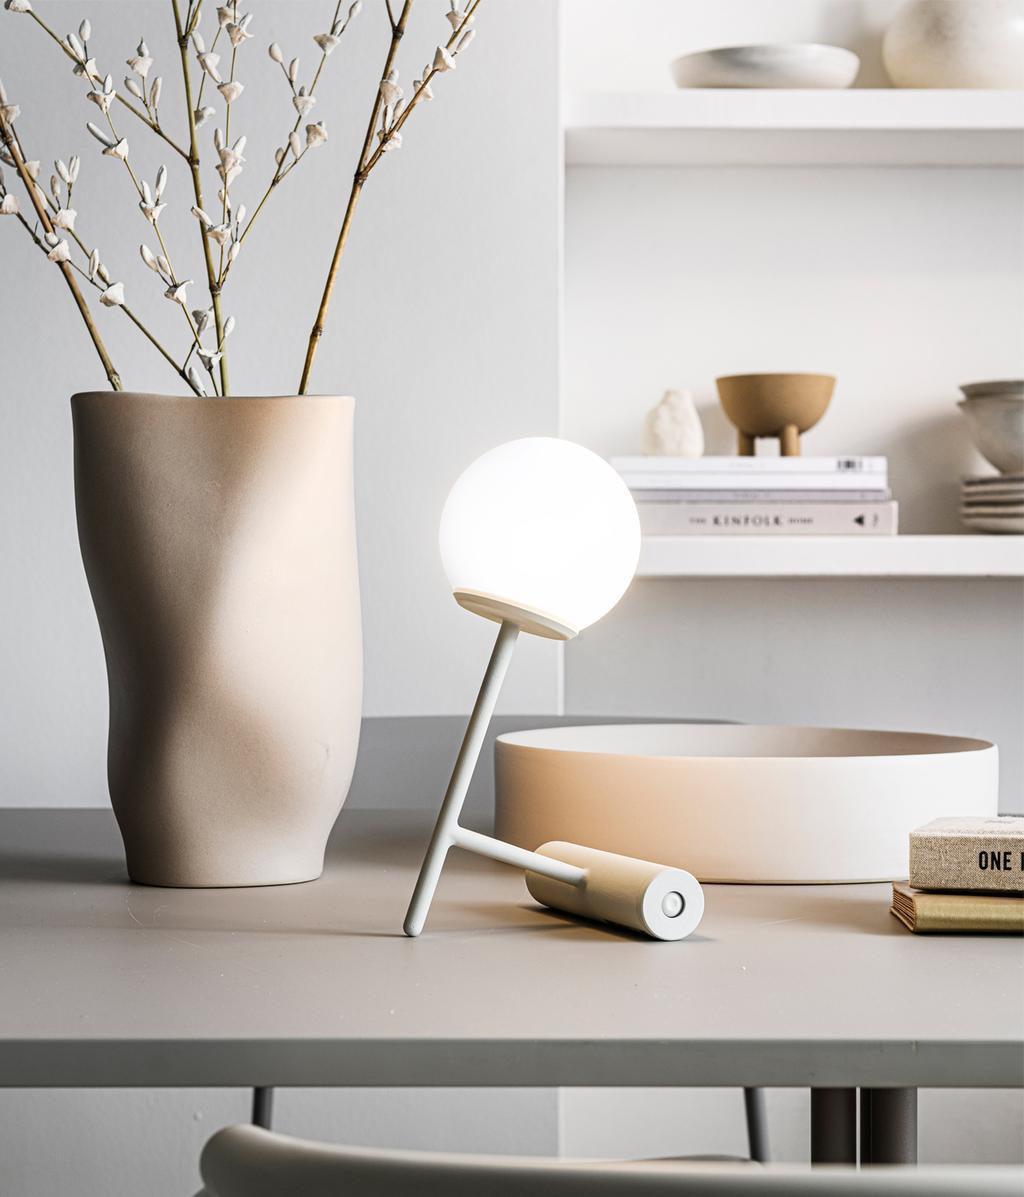 Tafellamp | Styling | vtwonen 13-2020